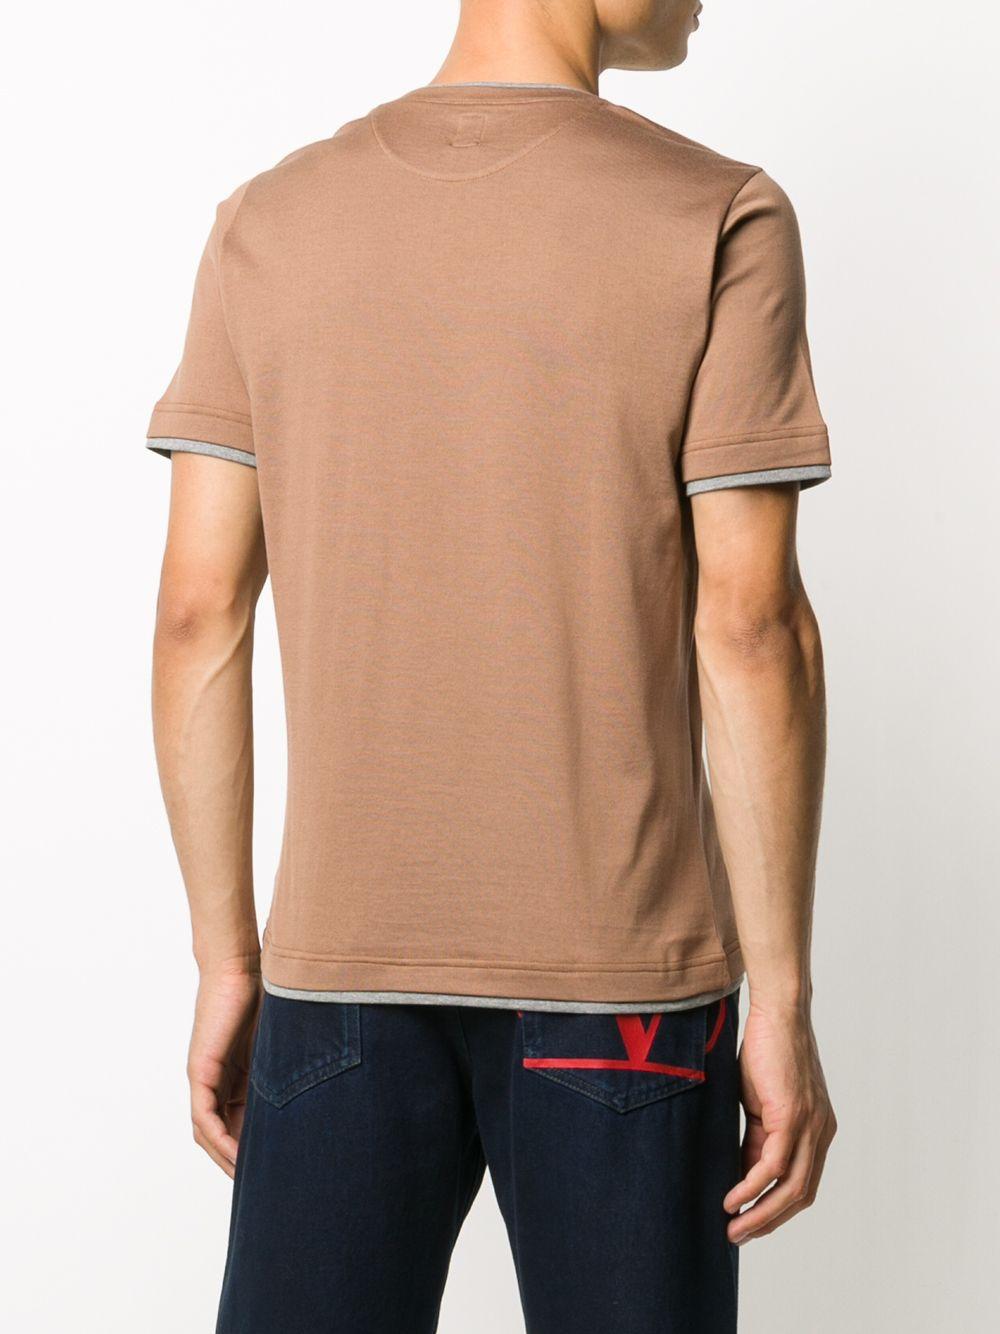 brown cotton t.shirt with grey embroidery ELEVENTY |  | B75TSHB07-TSH2600104